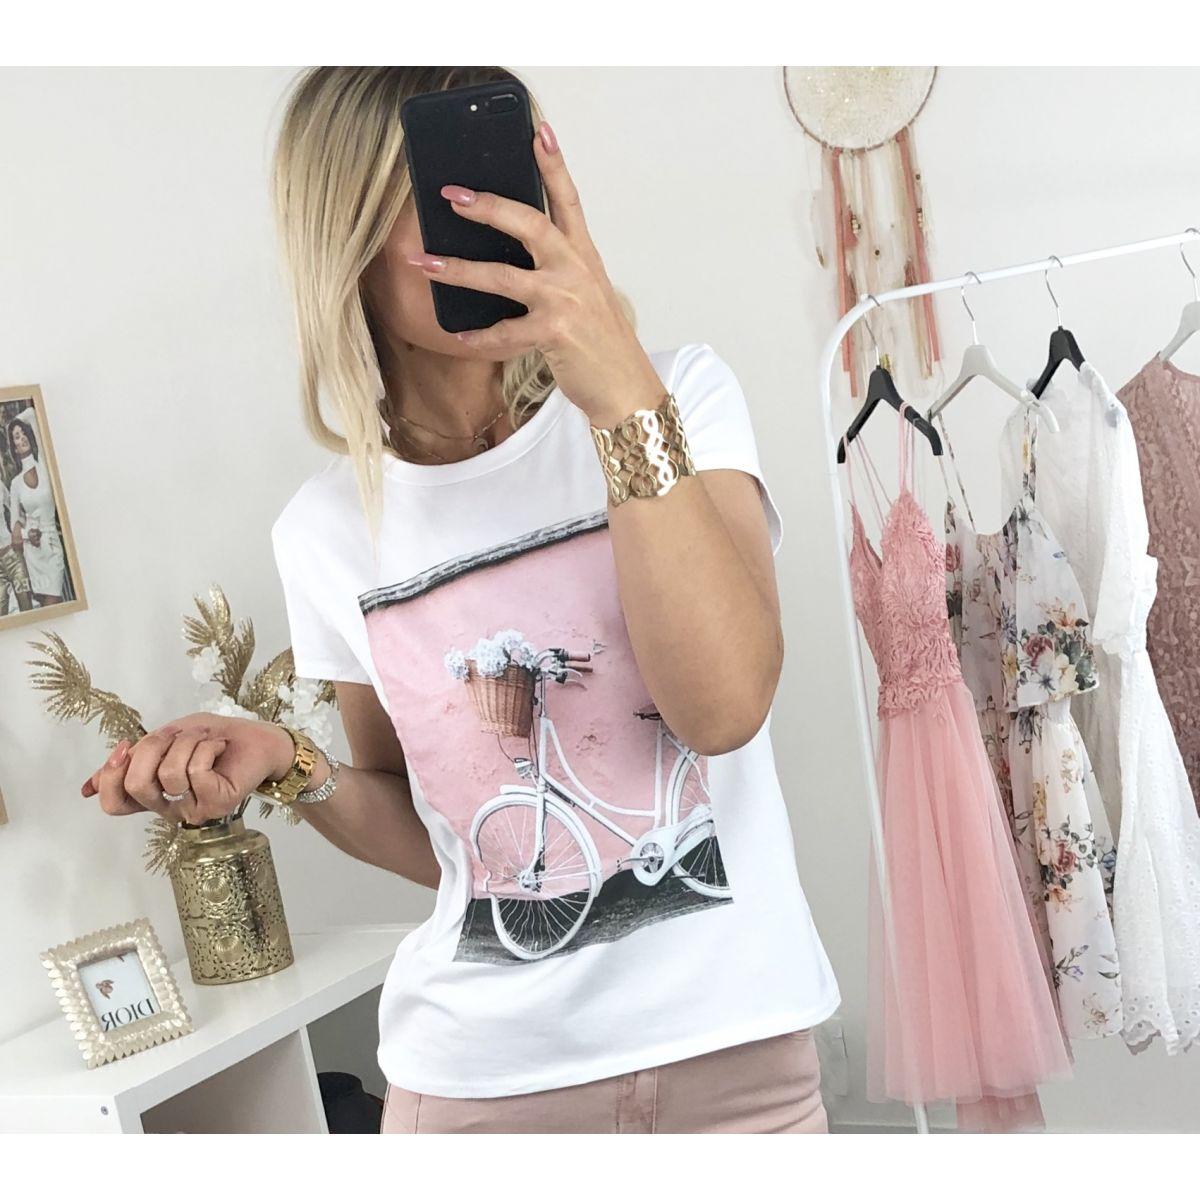 Tee shirt blanc imprimé bike rose